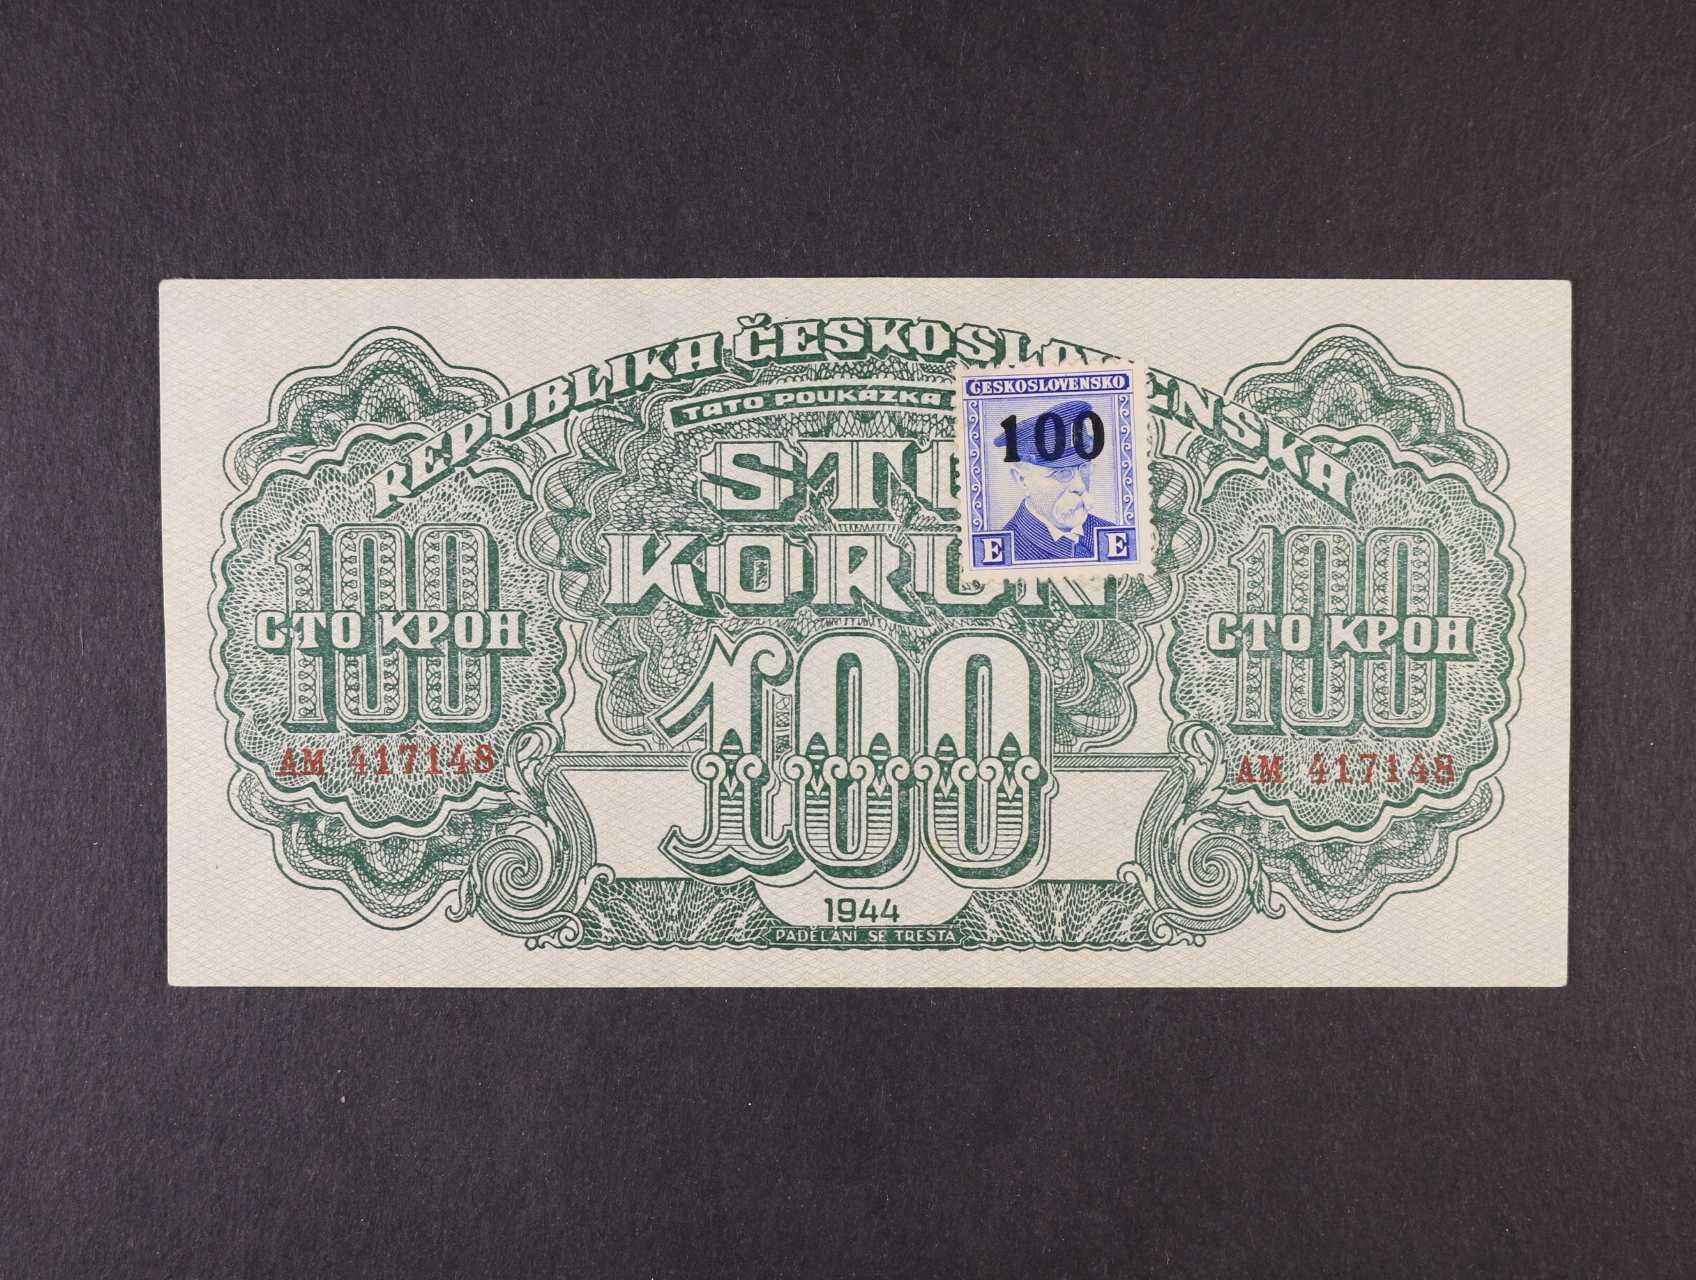 100 K 1944 série AM kolkovaná, číslovač 6b, Ba. 66a1, Pi. 53a